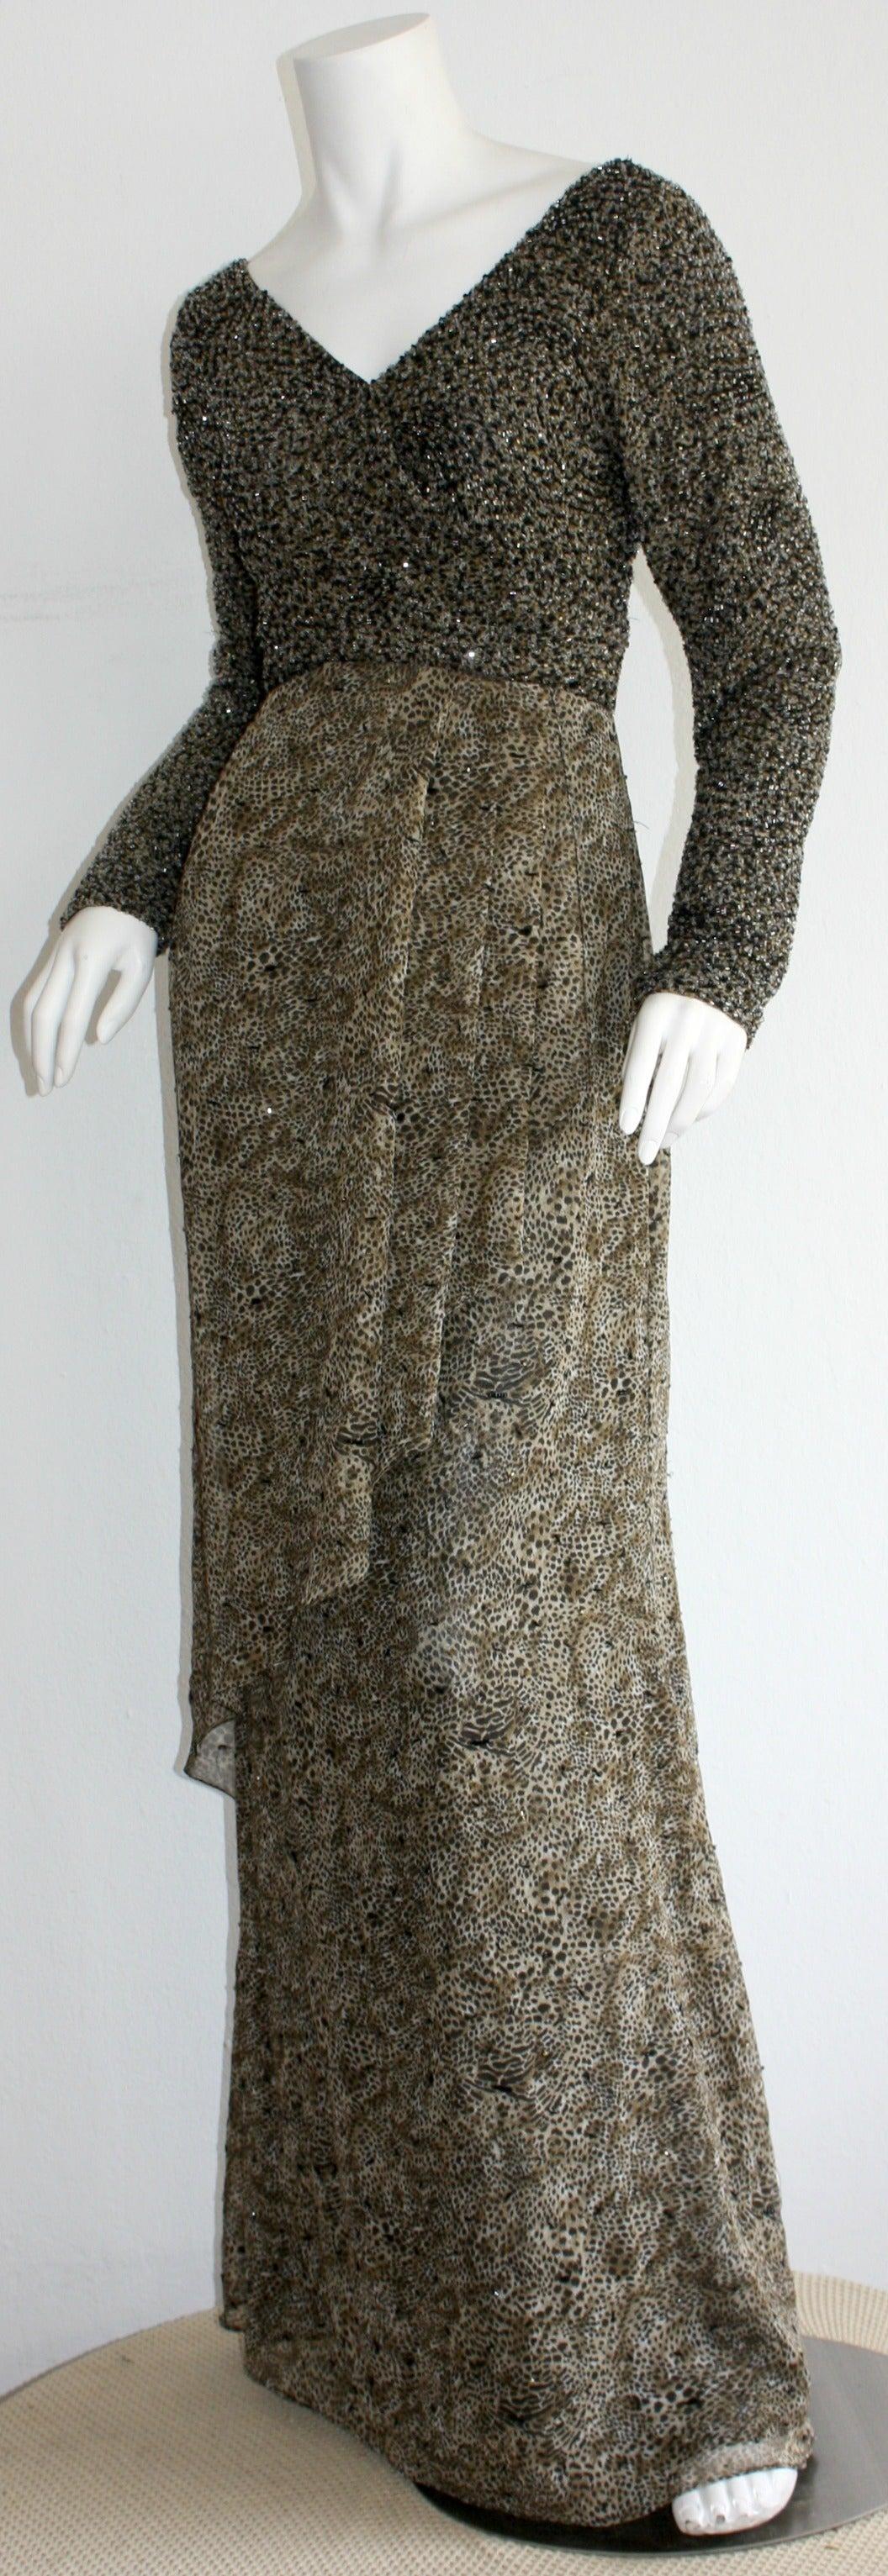 Stunning Vintage Bob Mackie Heavily Beaded Silk Chiffon Leopard Gown 5